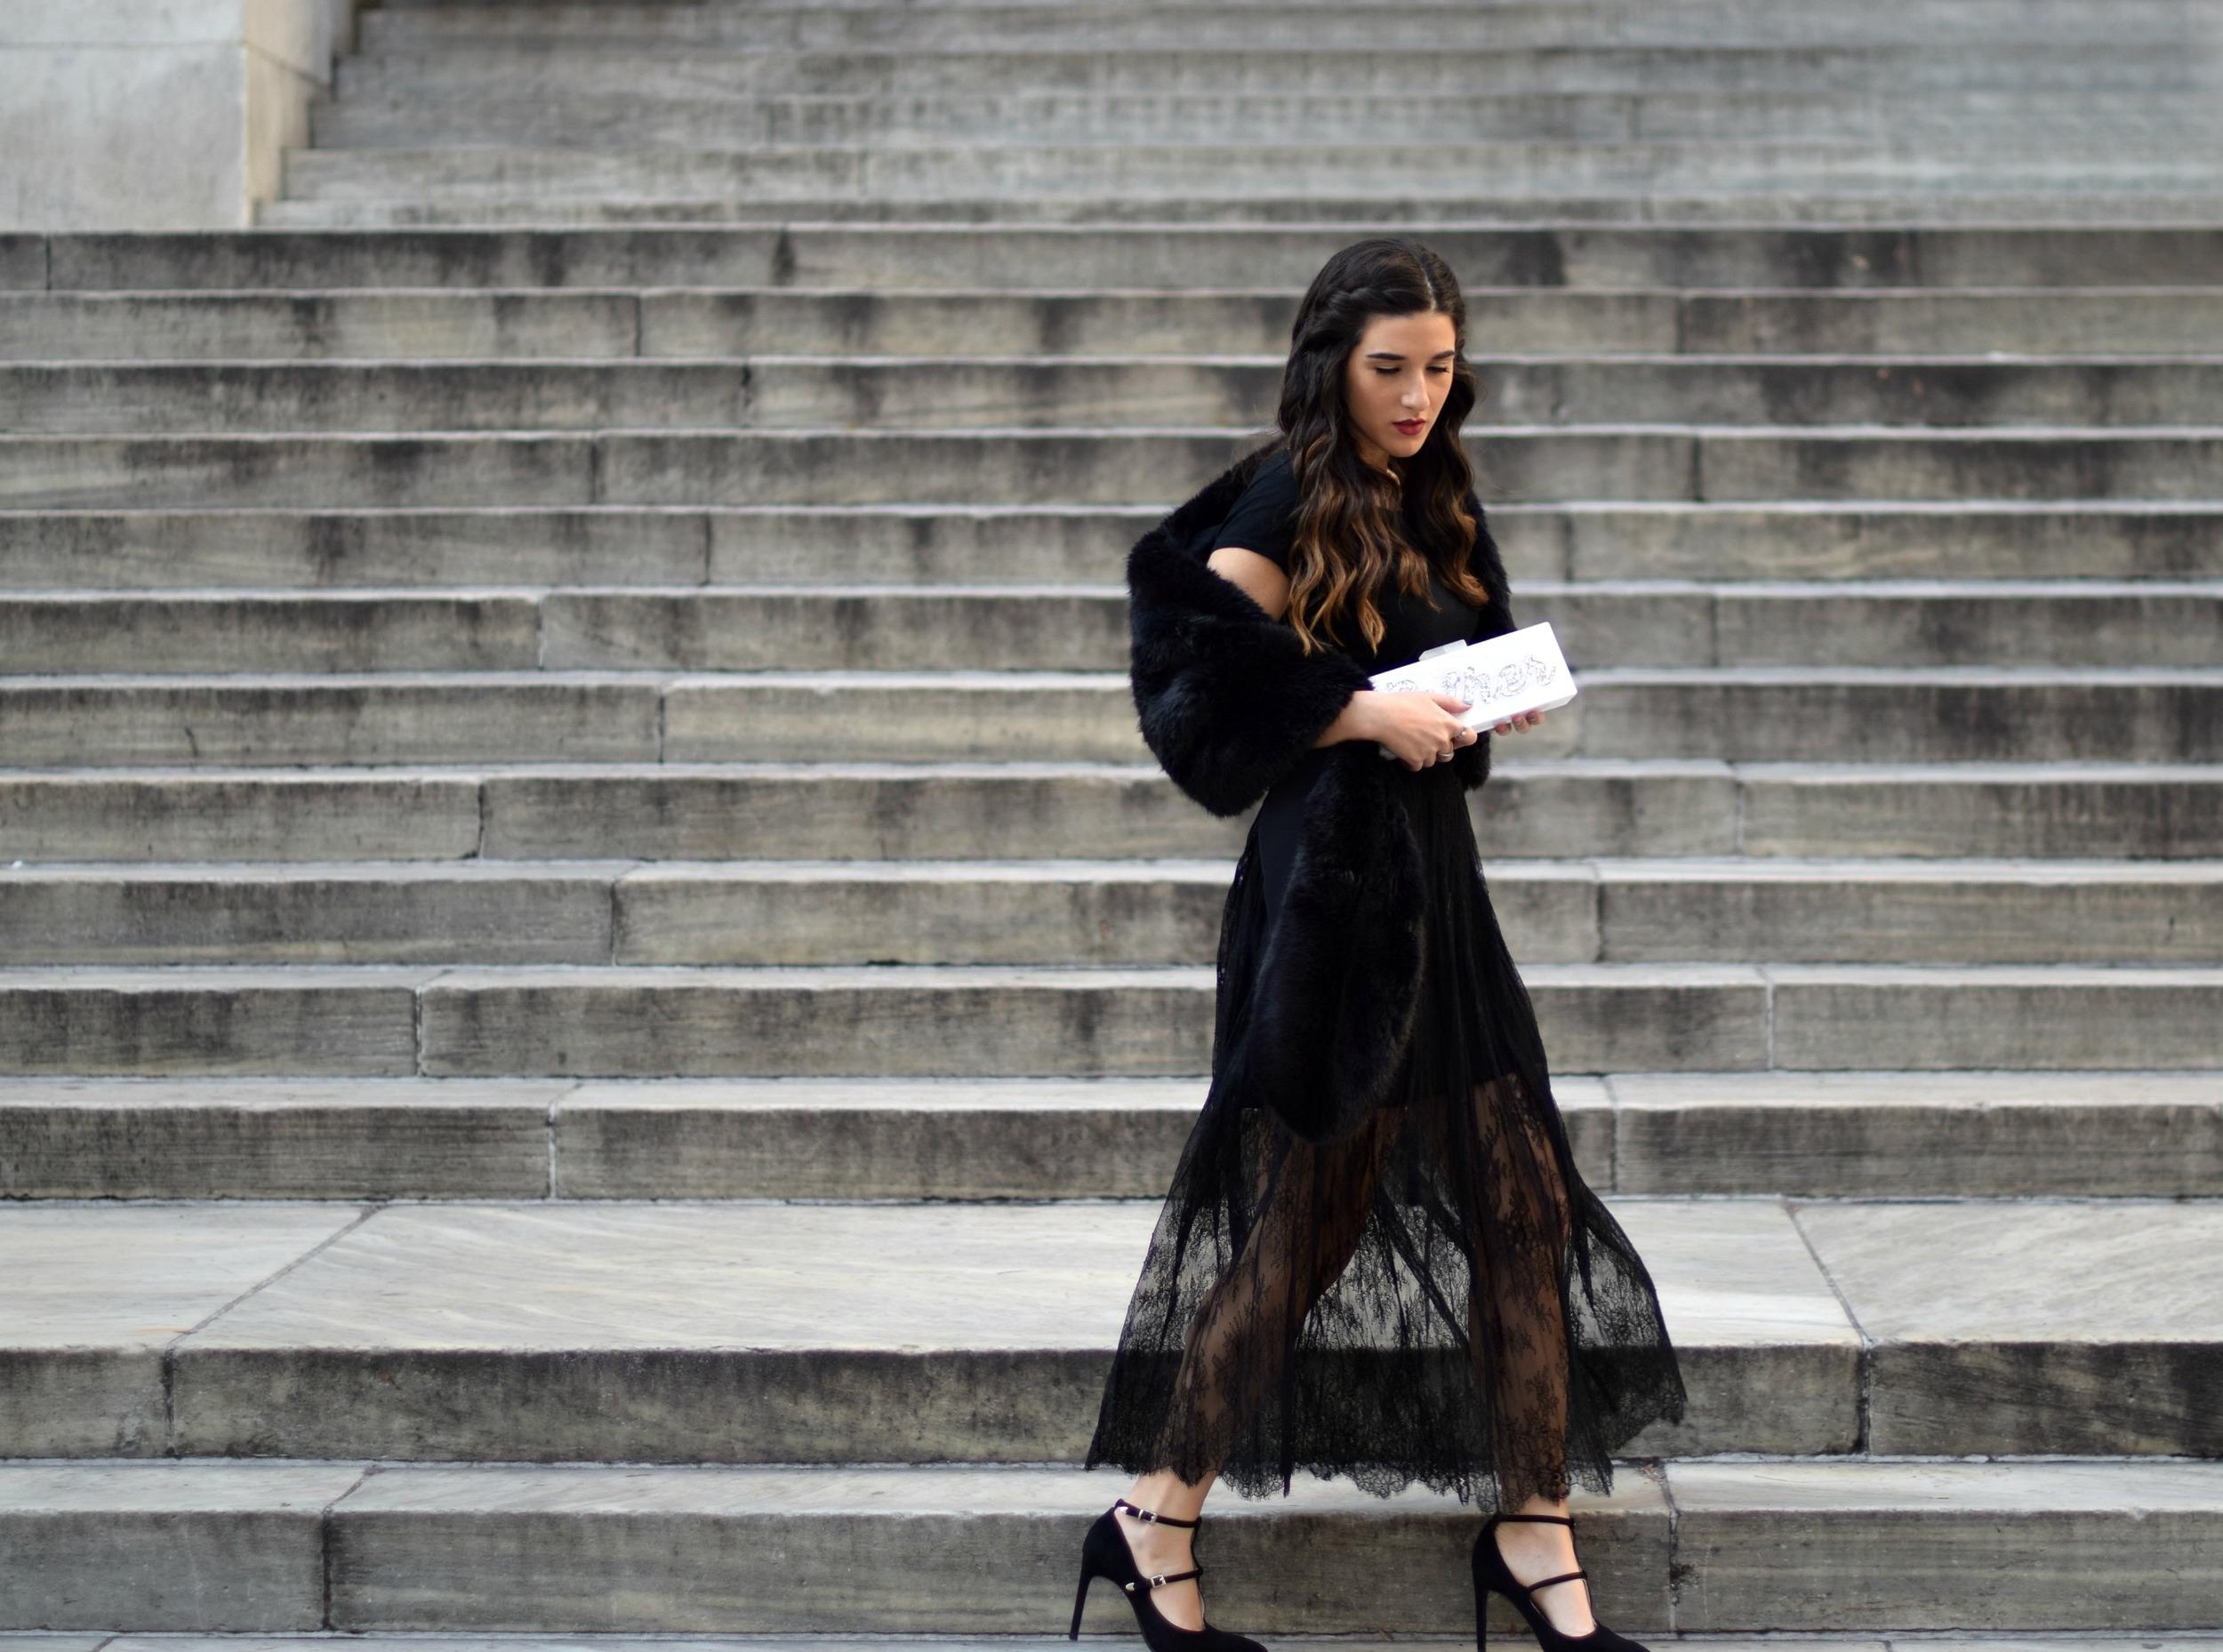 All Black Lace Skirt Fur Stole Louboutins & Love Fashion Blog Esther Santer NYC Street Style Blogger Outfit OOTD Classy Fancy Look Winter Wear Women Girls Monochrome Monogram Clutch Photoshoot Zara Heels Stiletto Beautiful Shop Shoes Inspo Inspiration.jpg